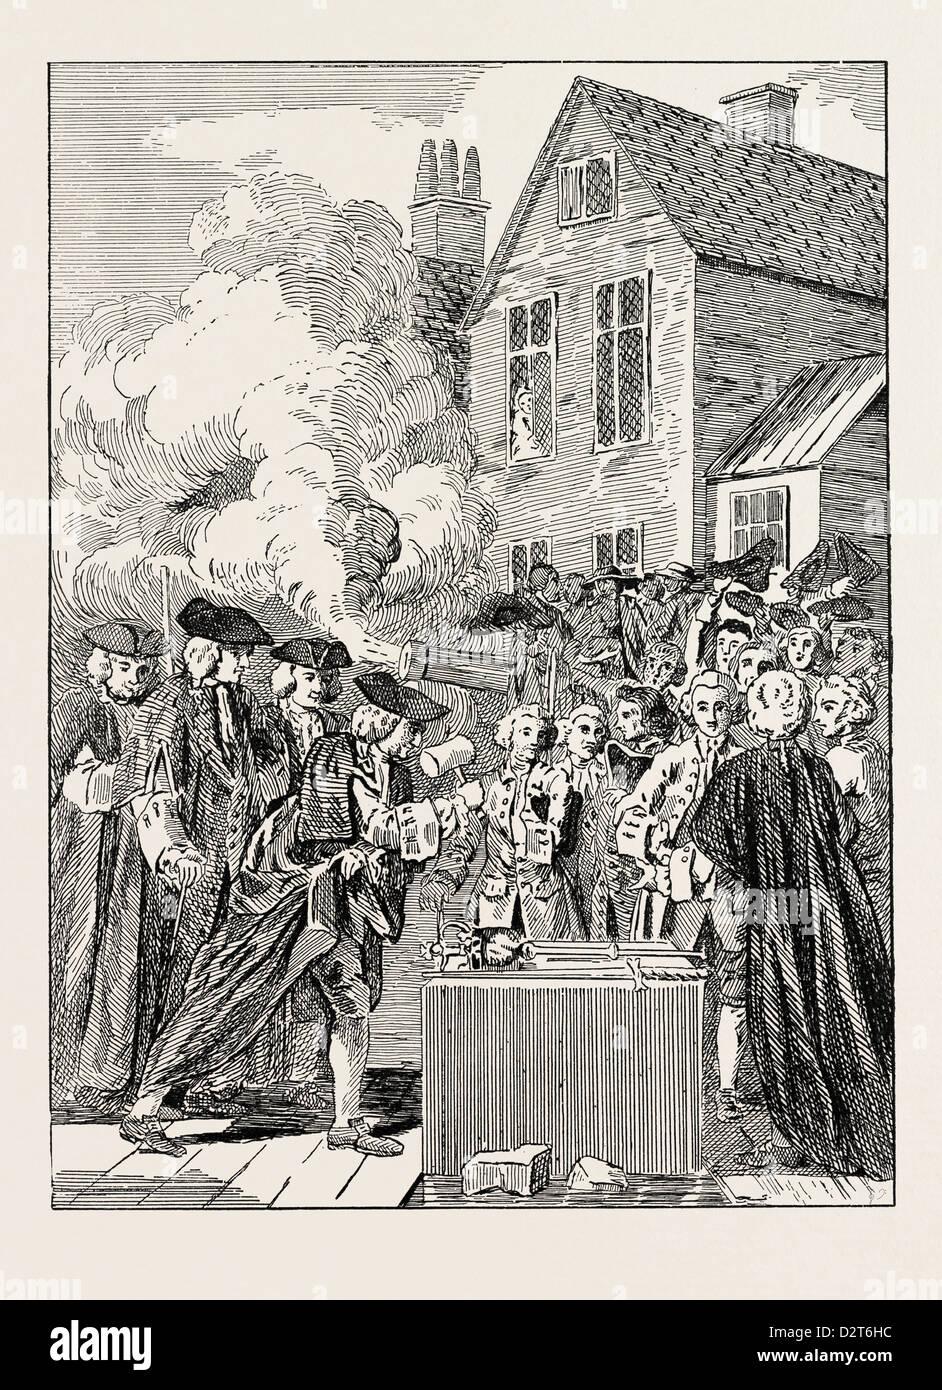 LAYING THE FOUNDATION-STONE OF BLACKFRIARS BRIDGE 1760 LONDON - Stock Image